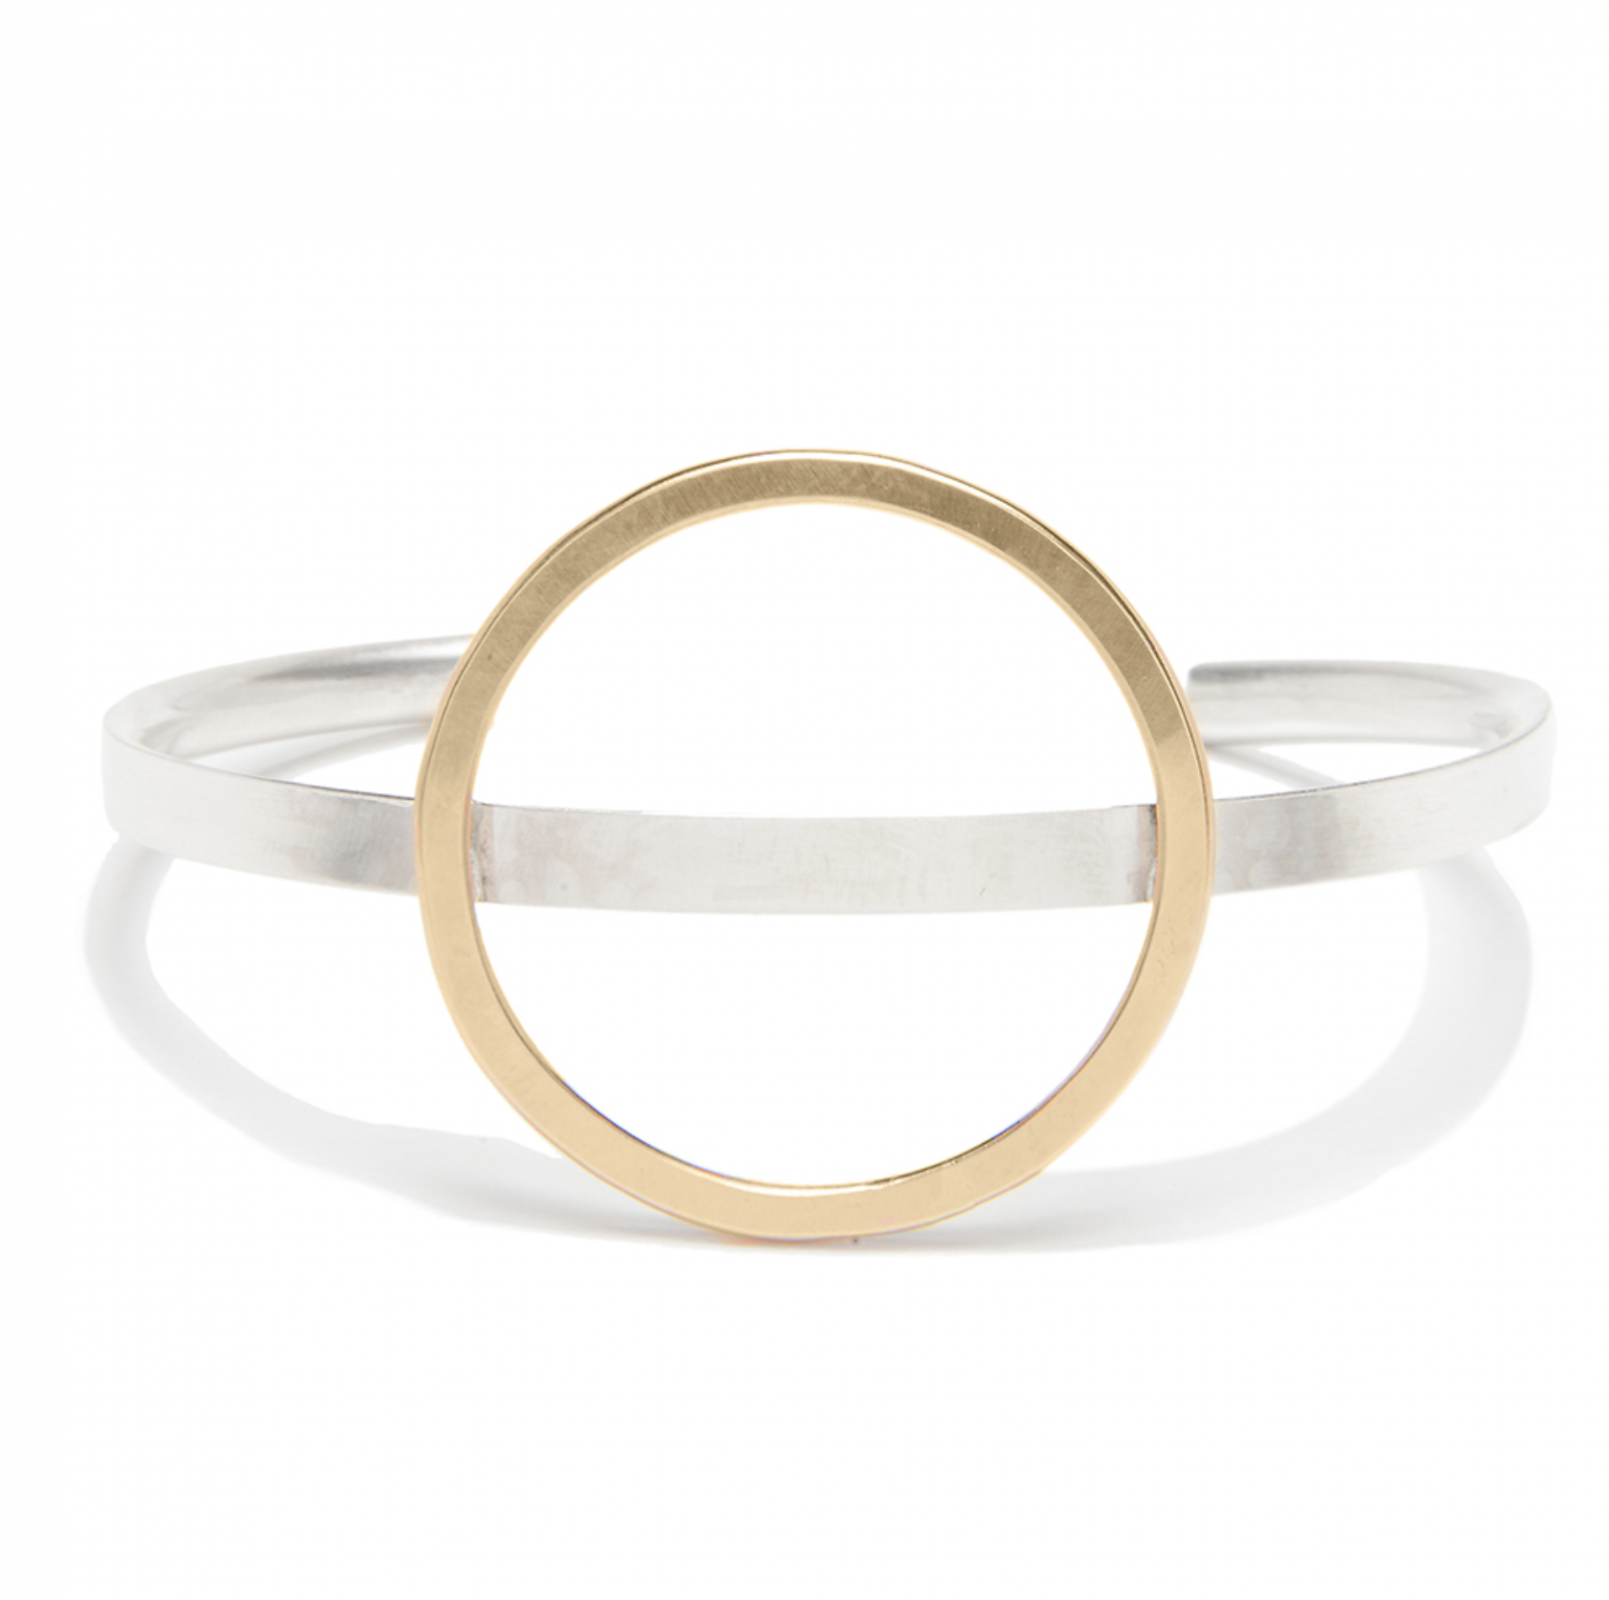 J&I Circle Cuff Bracelet